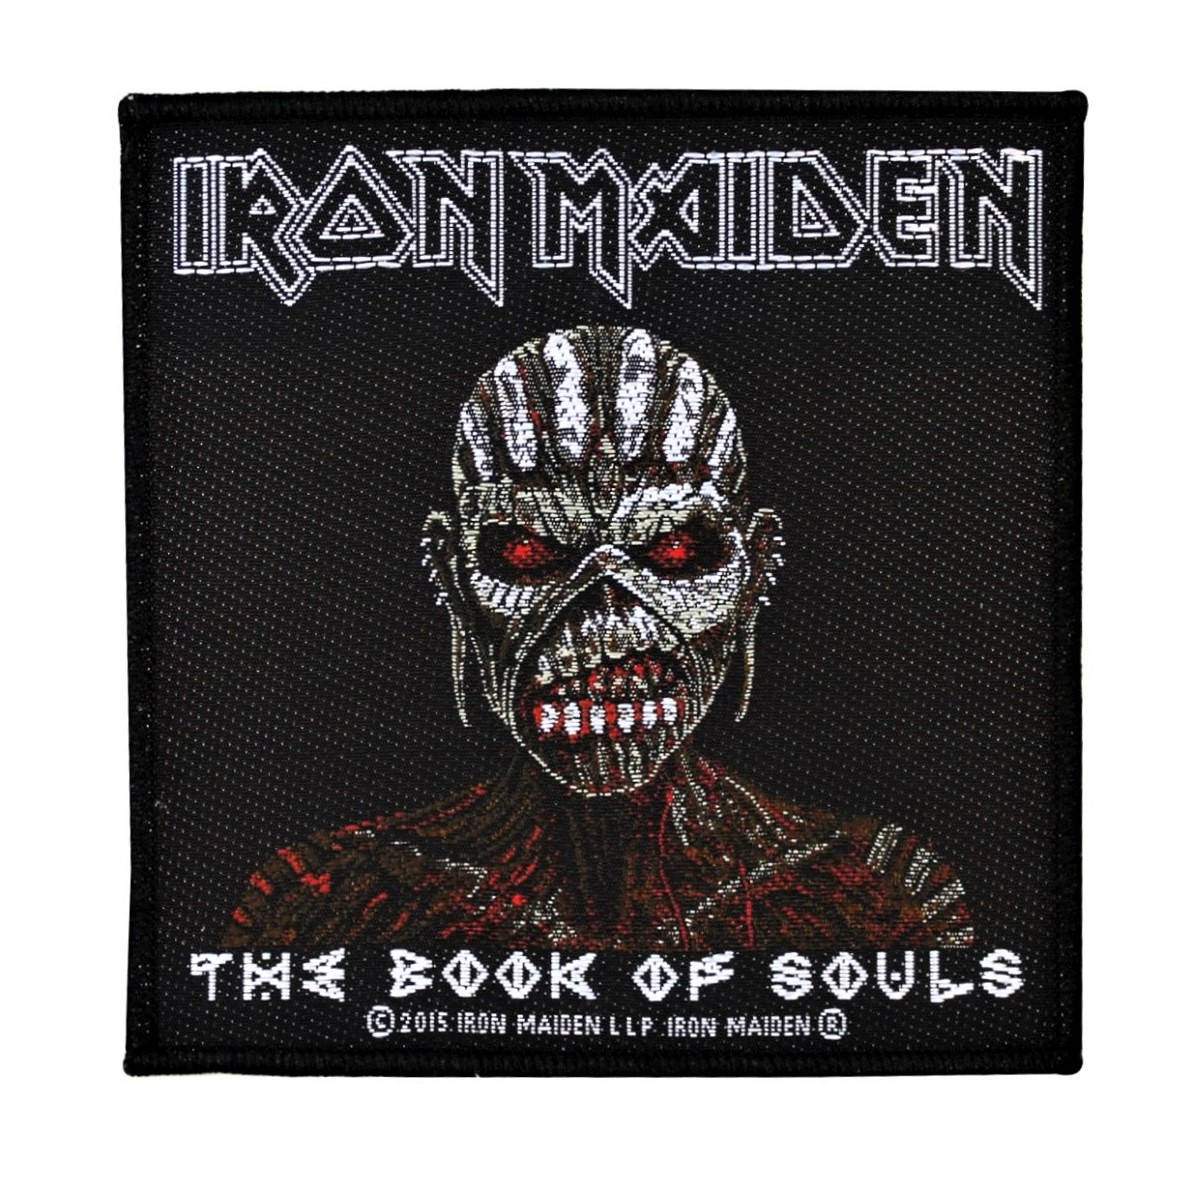 The book of souls iron maiden album artwork